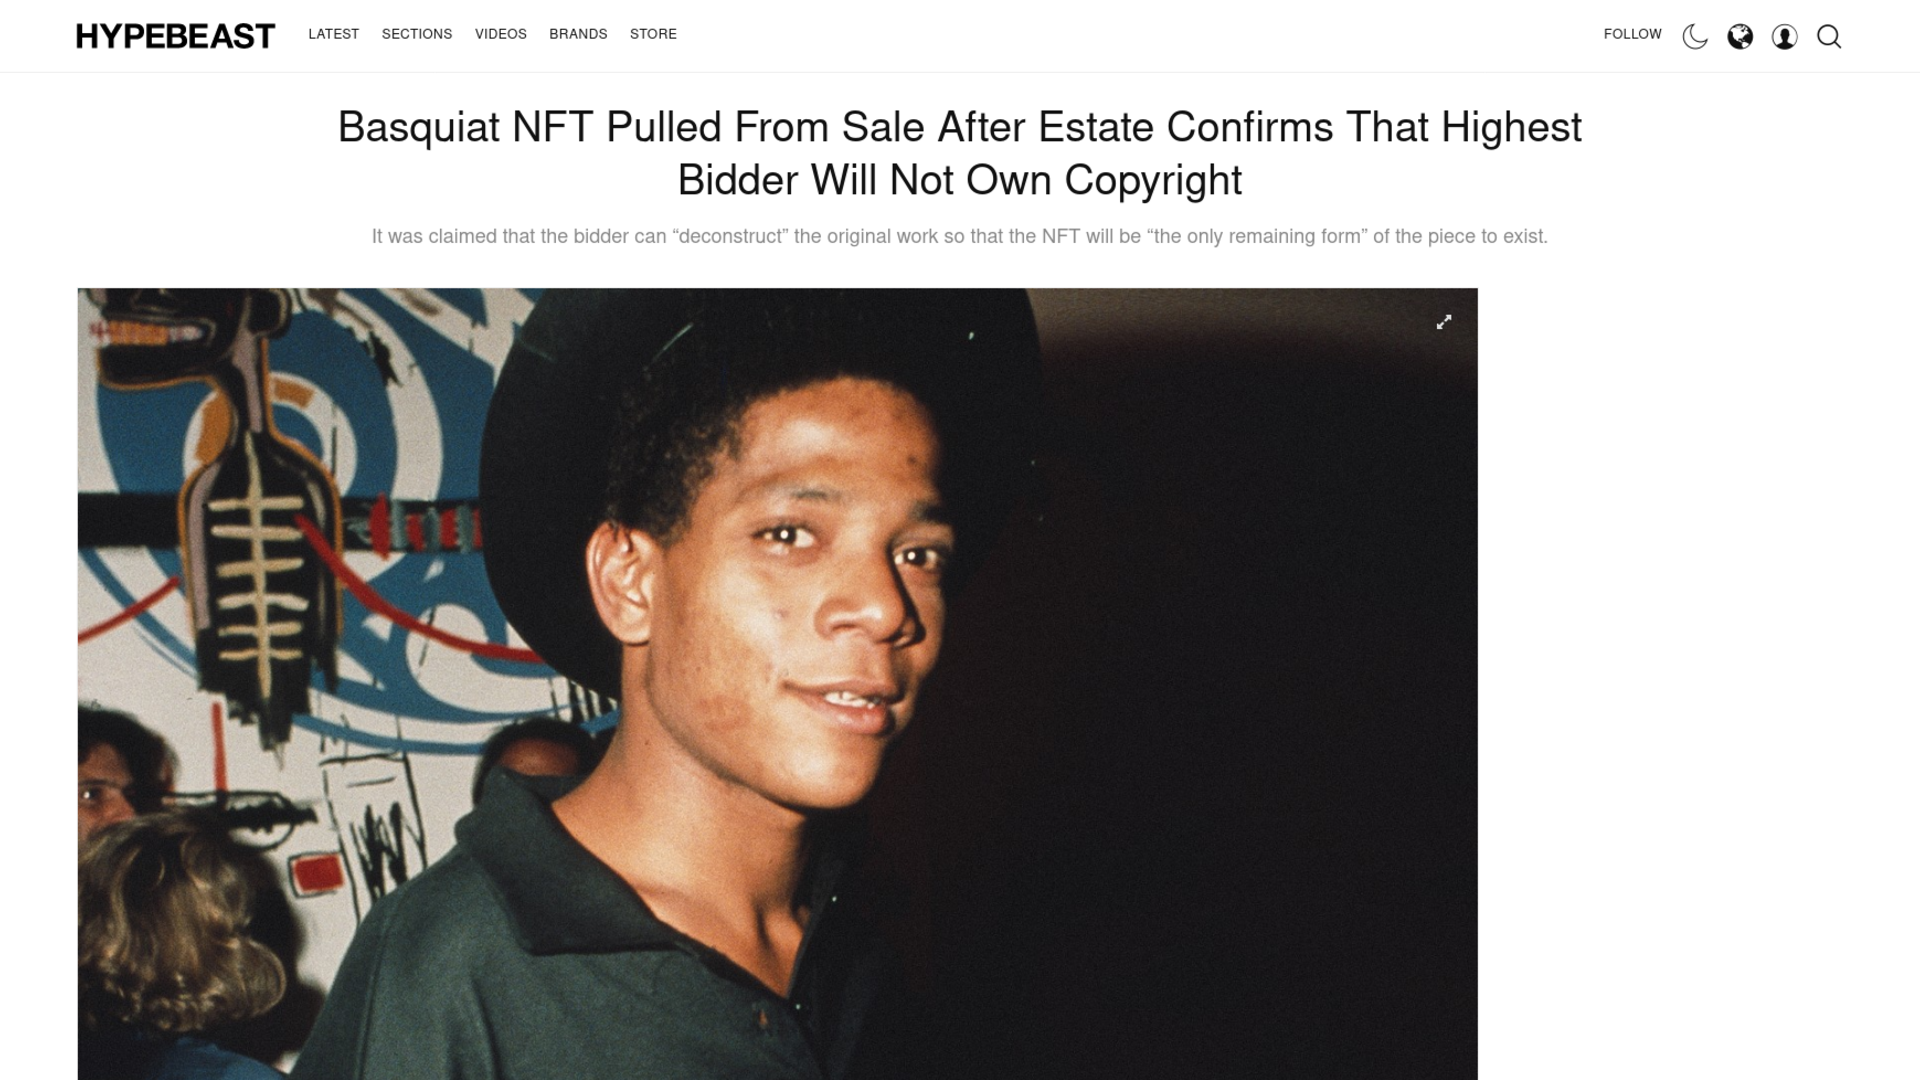 Fairness Rocks News Basquiat NFT Pulled From Sale After Estate Confirms That Highest Bidder Will Not Own Copyright